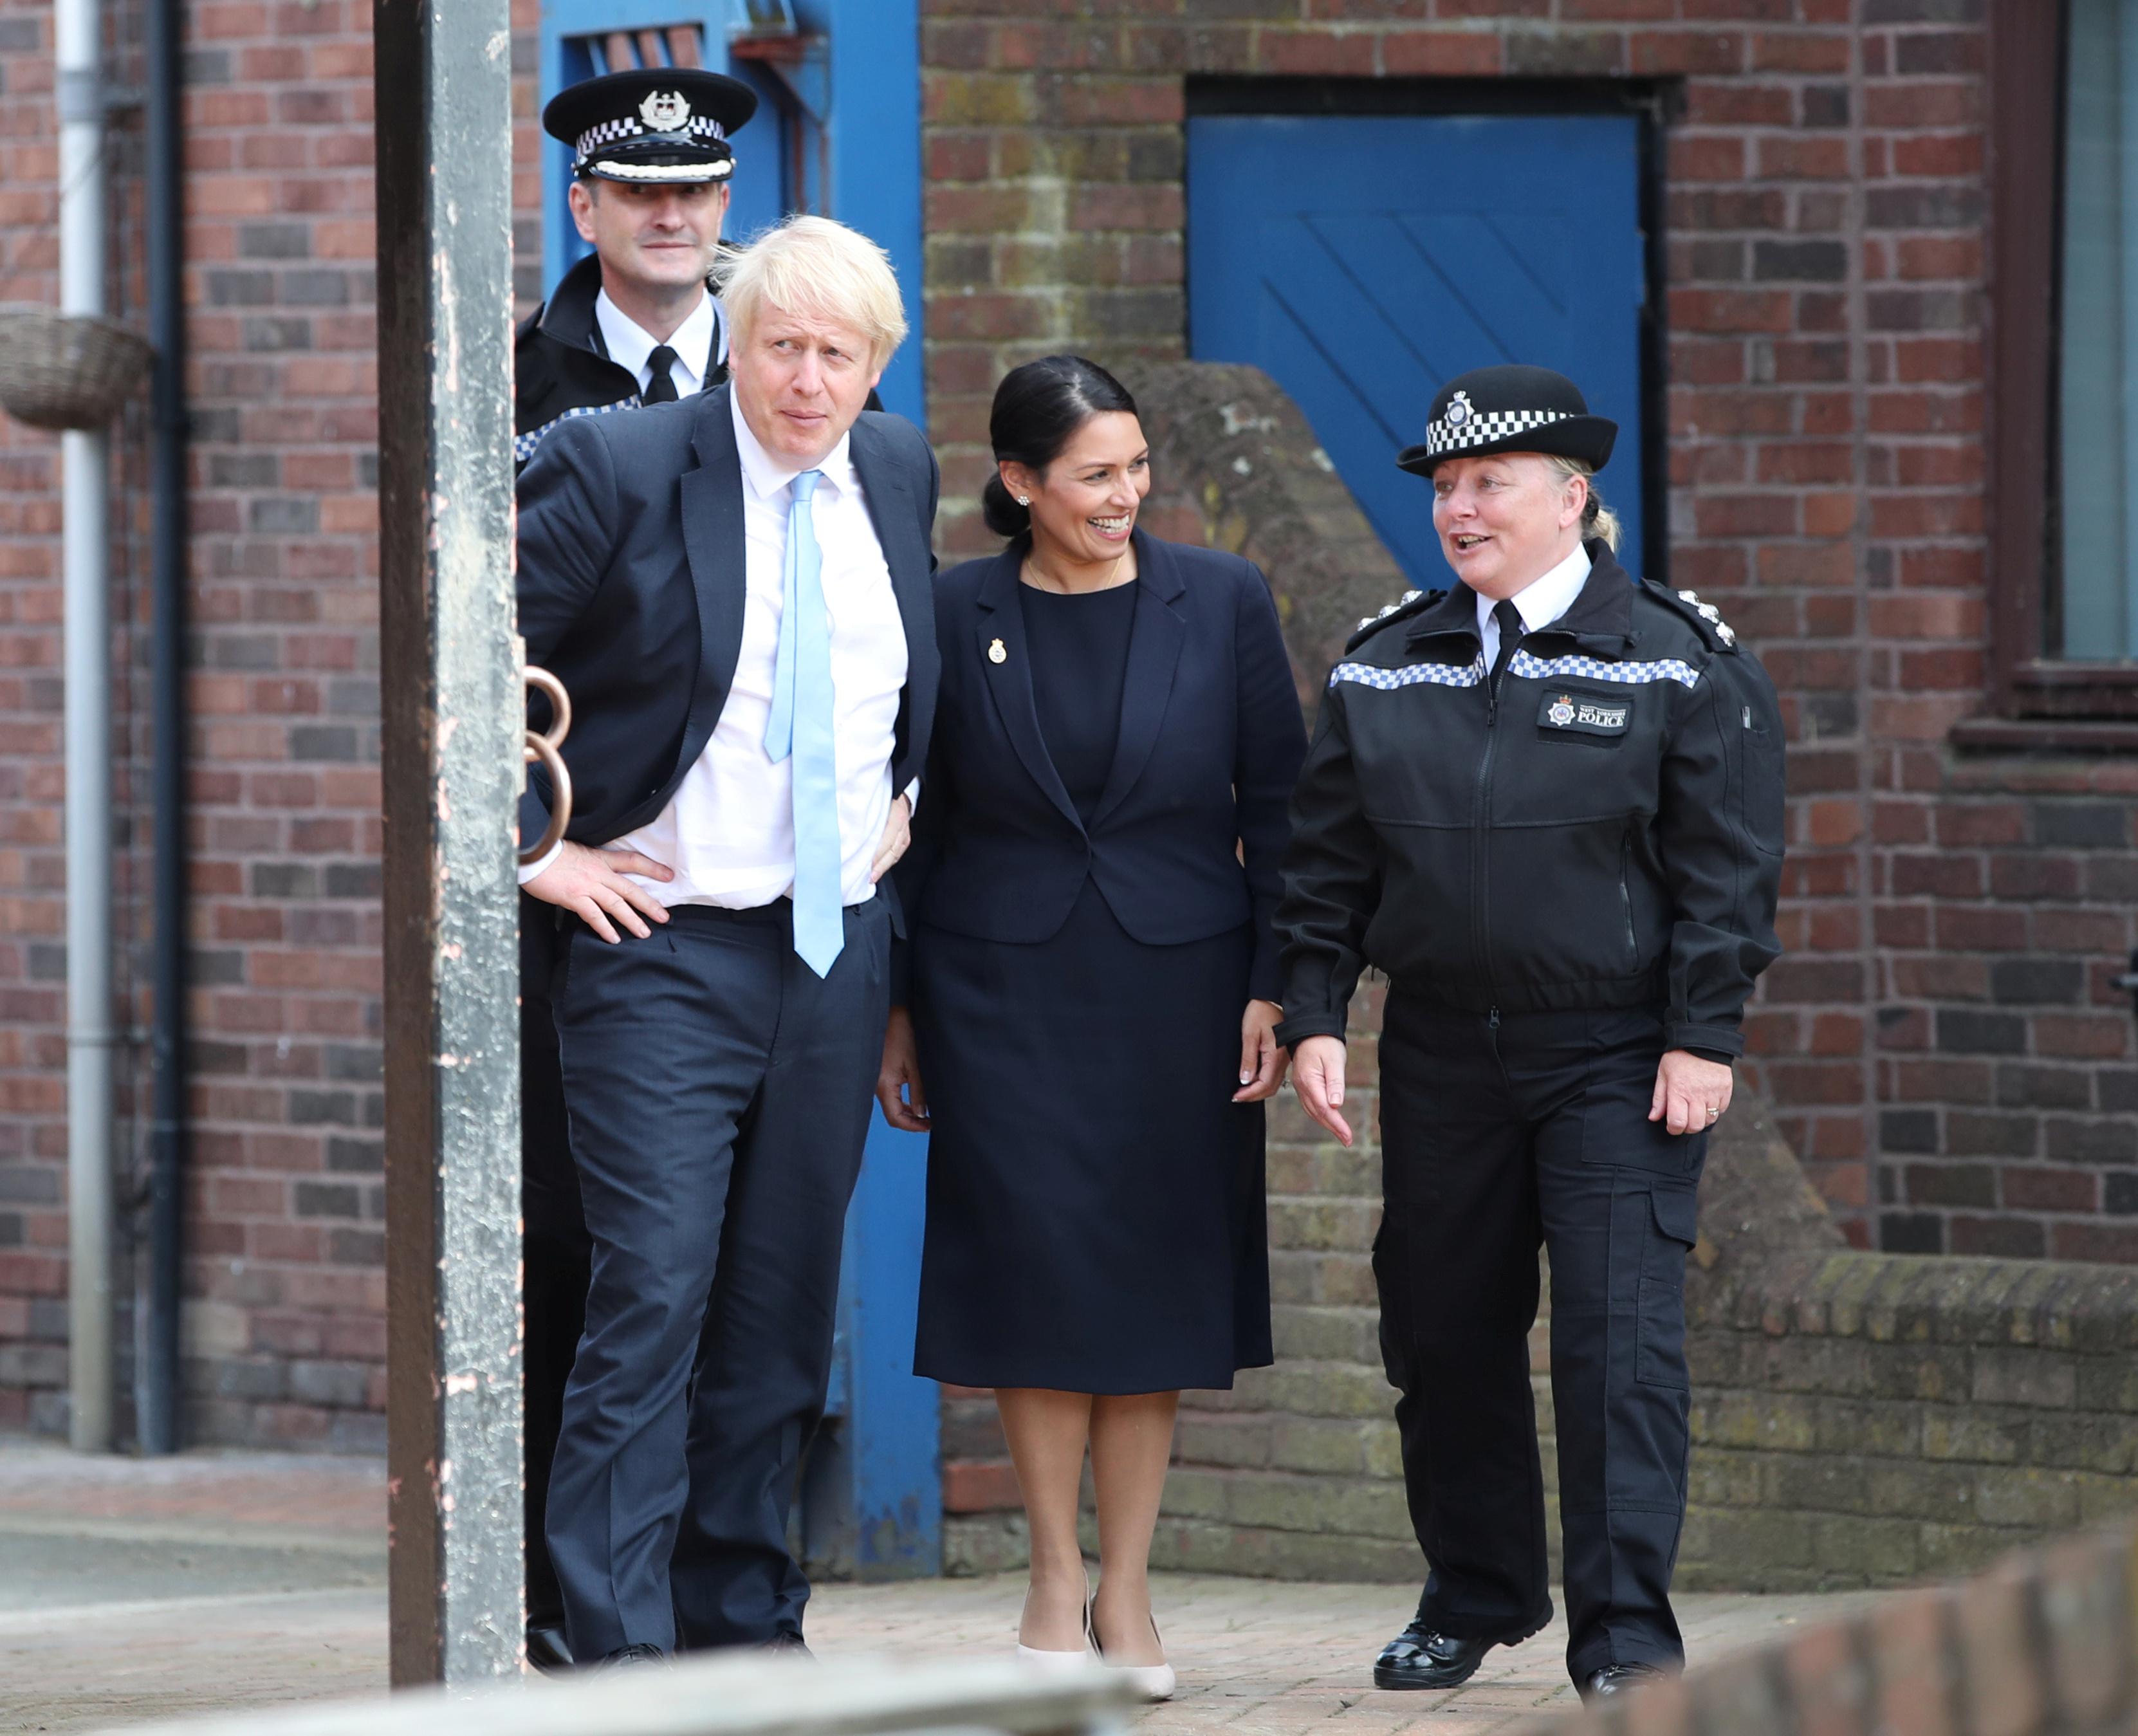 Prime minister Boris Johnson, home secretary Priti Patel, sergeant Annette Twigg and West Yorkshire Police Chief constable John Robins visit West Yorkshire Police Training and Development Centre